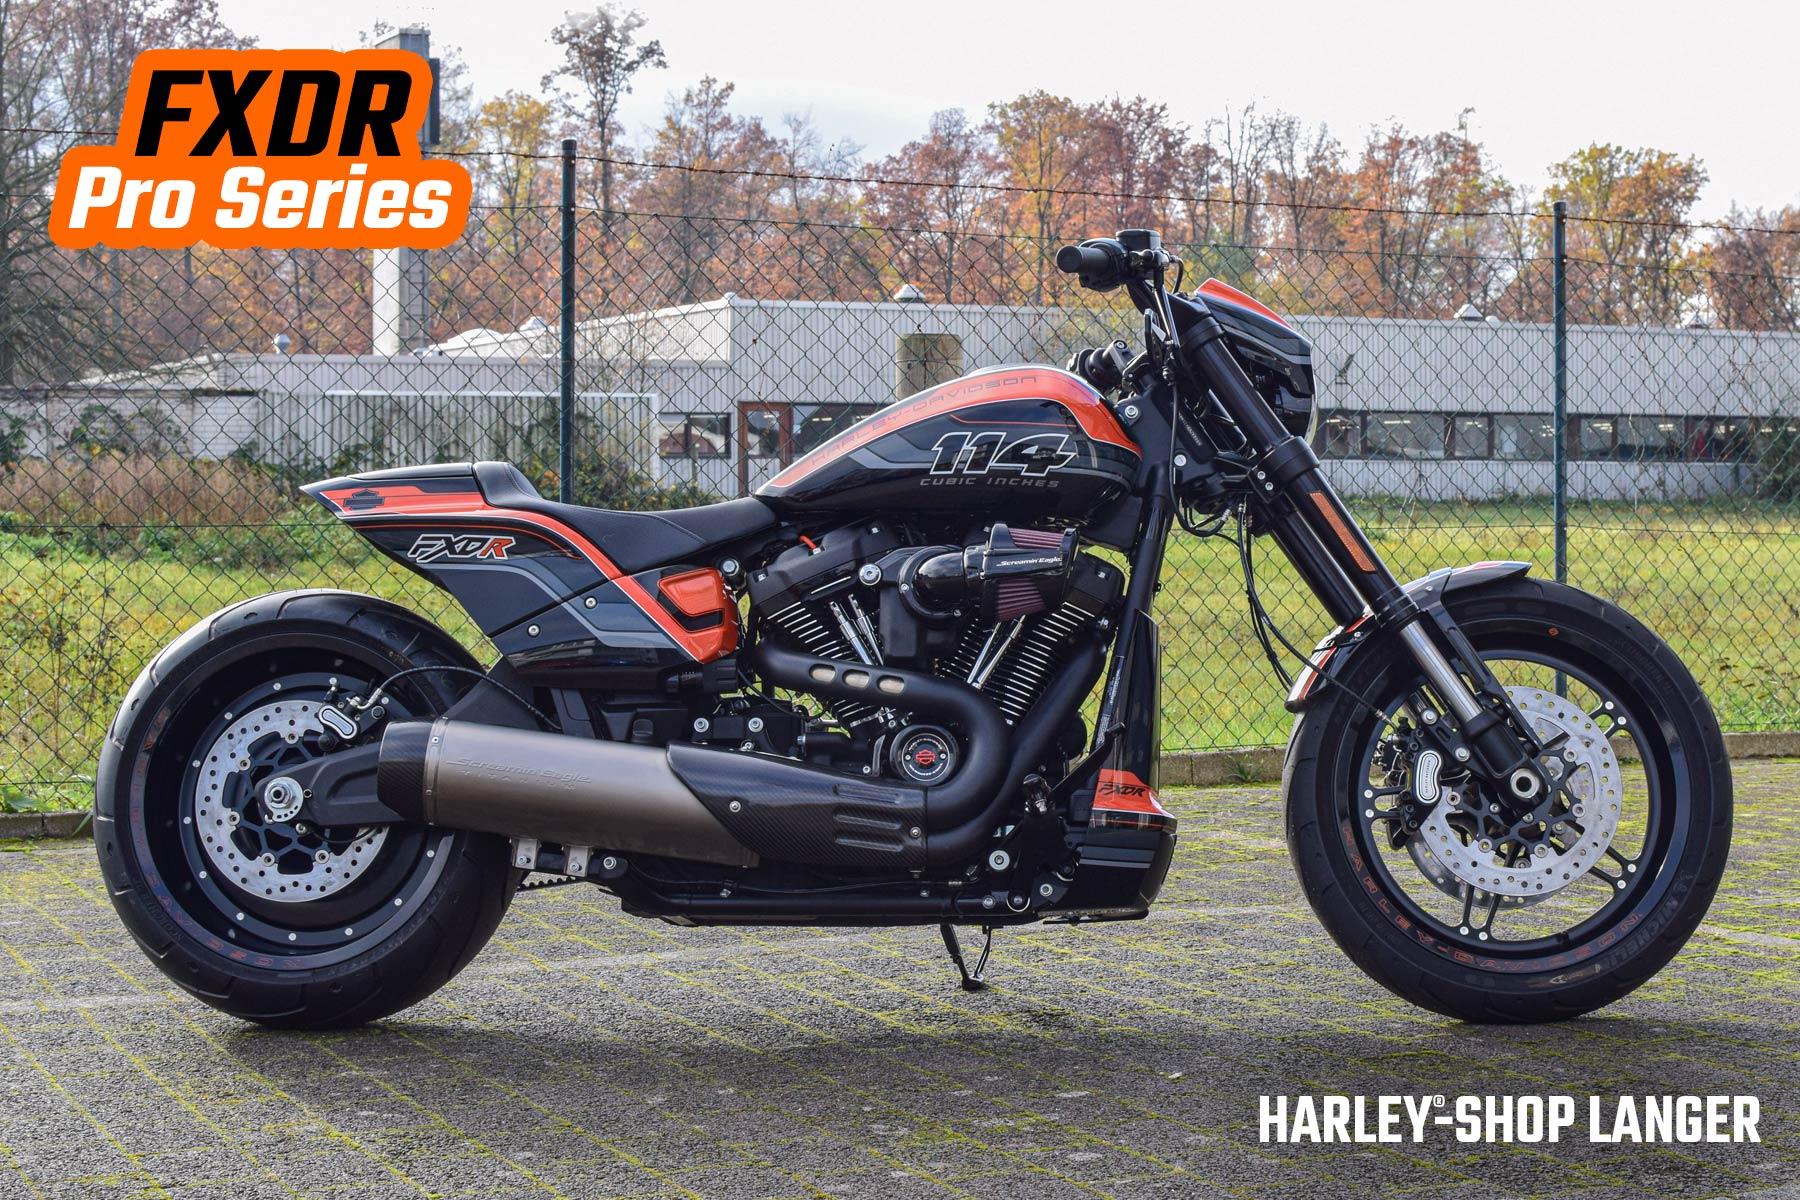 Harley-Shop Langer FXDR Pro Series Umbau Custombike